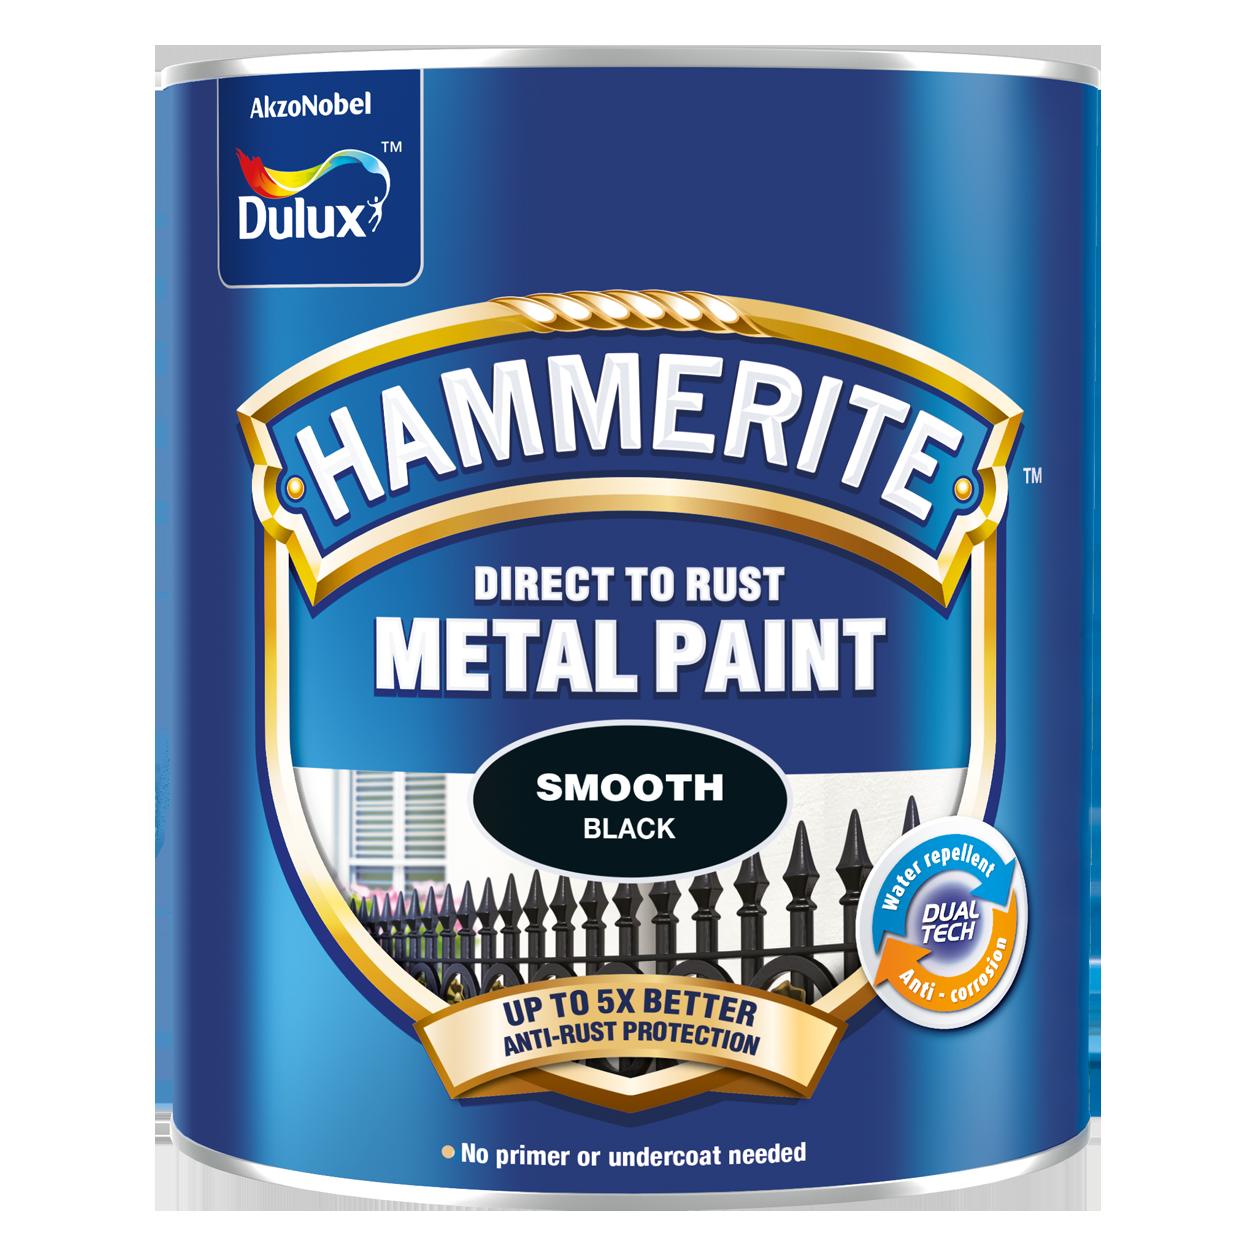 Sơn Kim Loại Hammerite Direct To Rust - Bề mặt bóng